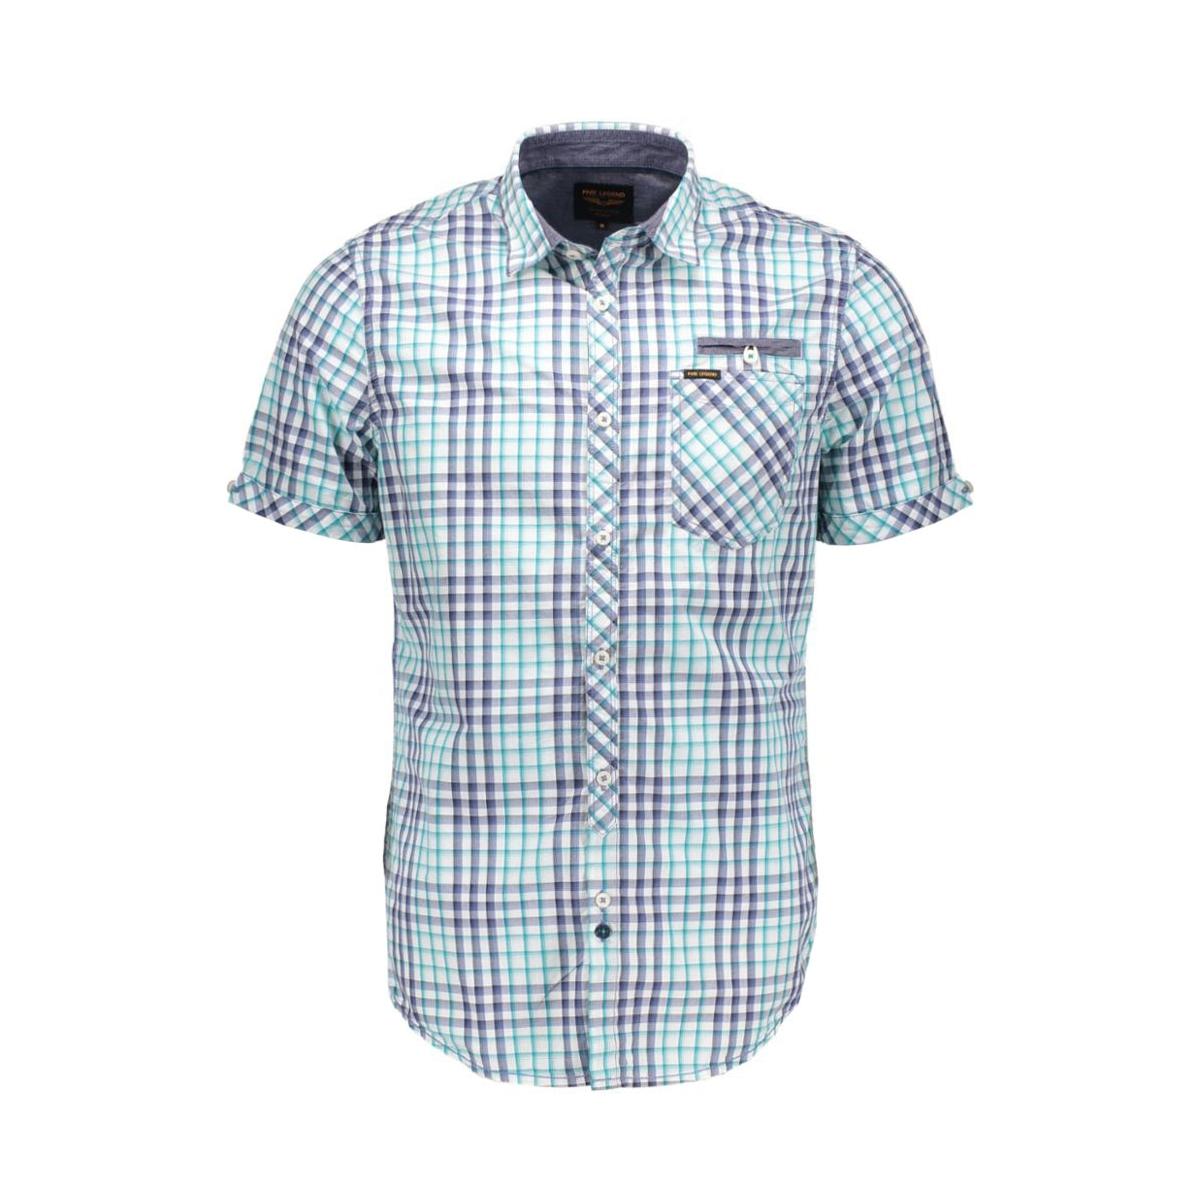 psis64202 pme legend overhemd